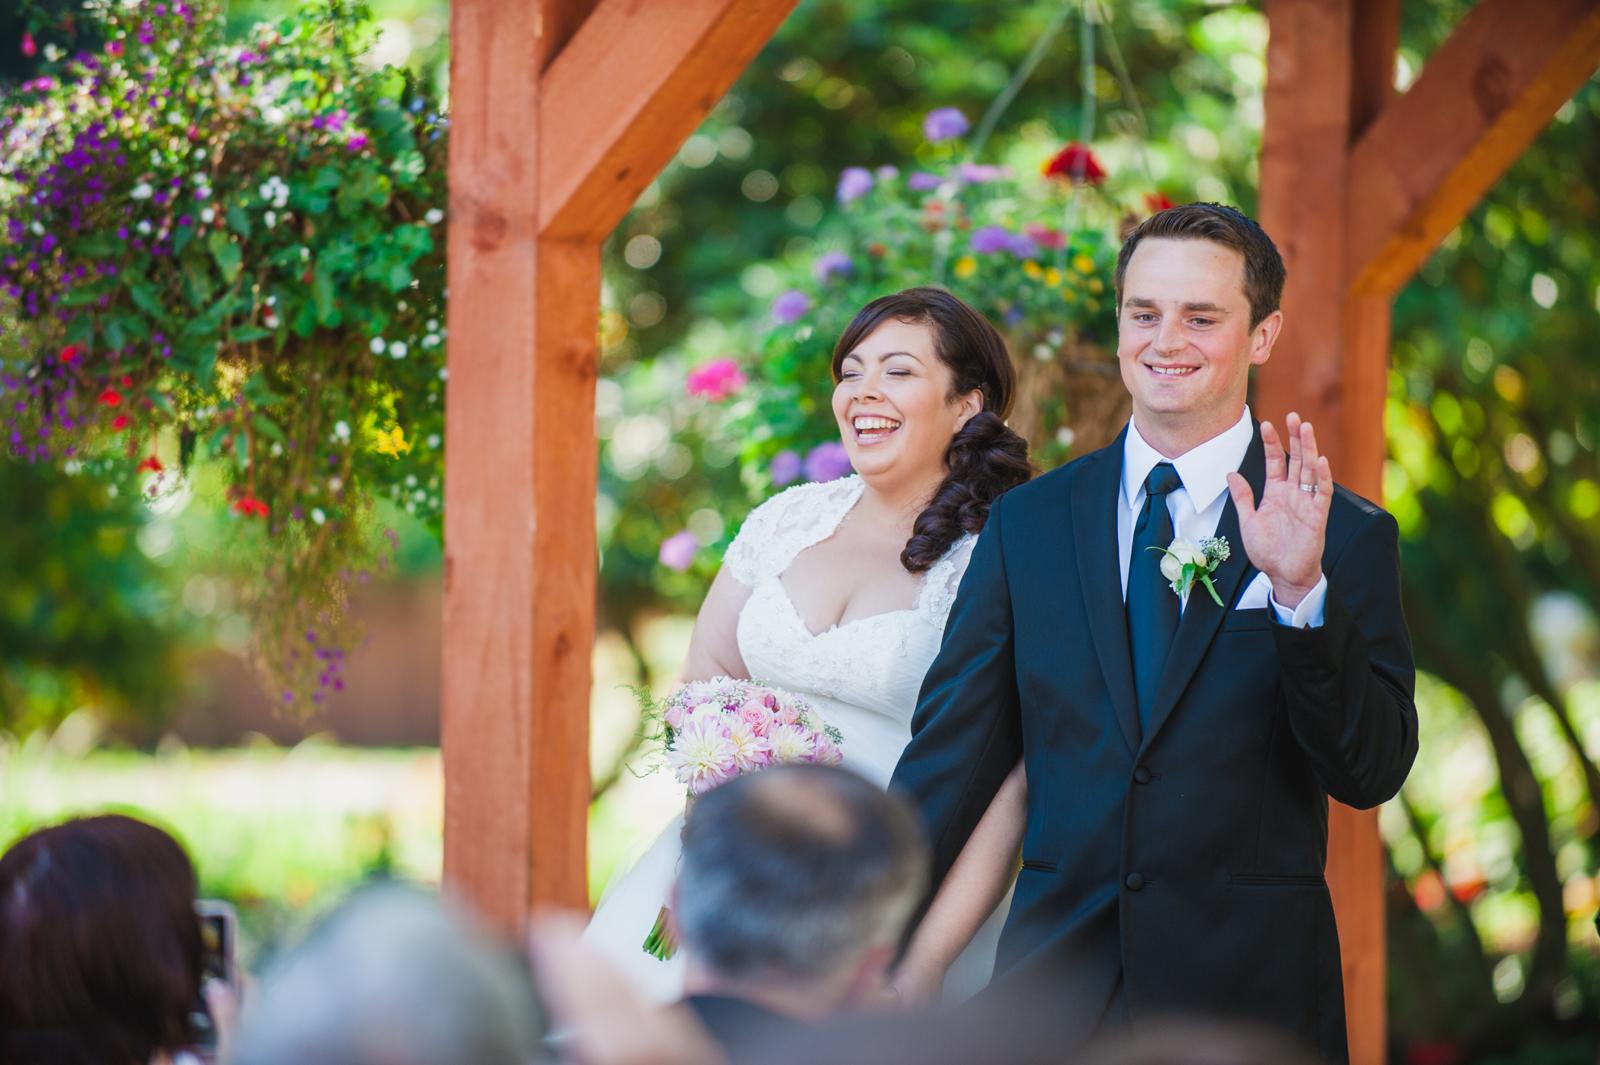 bc-wedding-photographers-harrison-lake-wedding-29.jpg